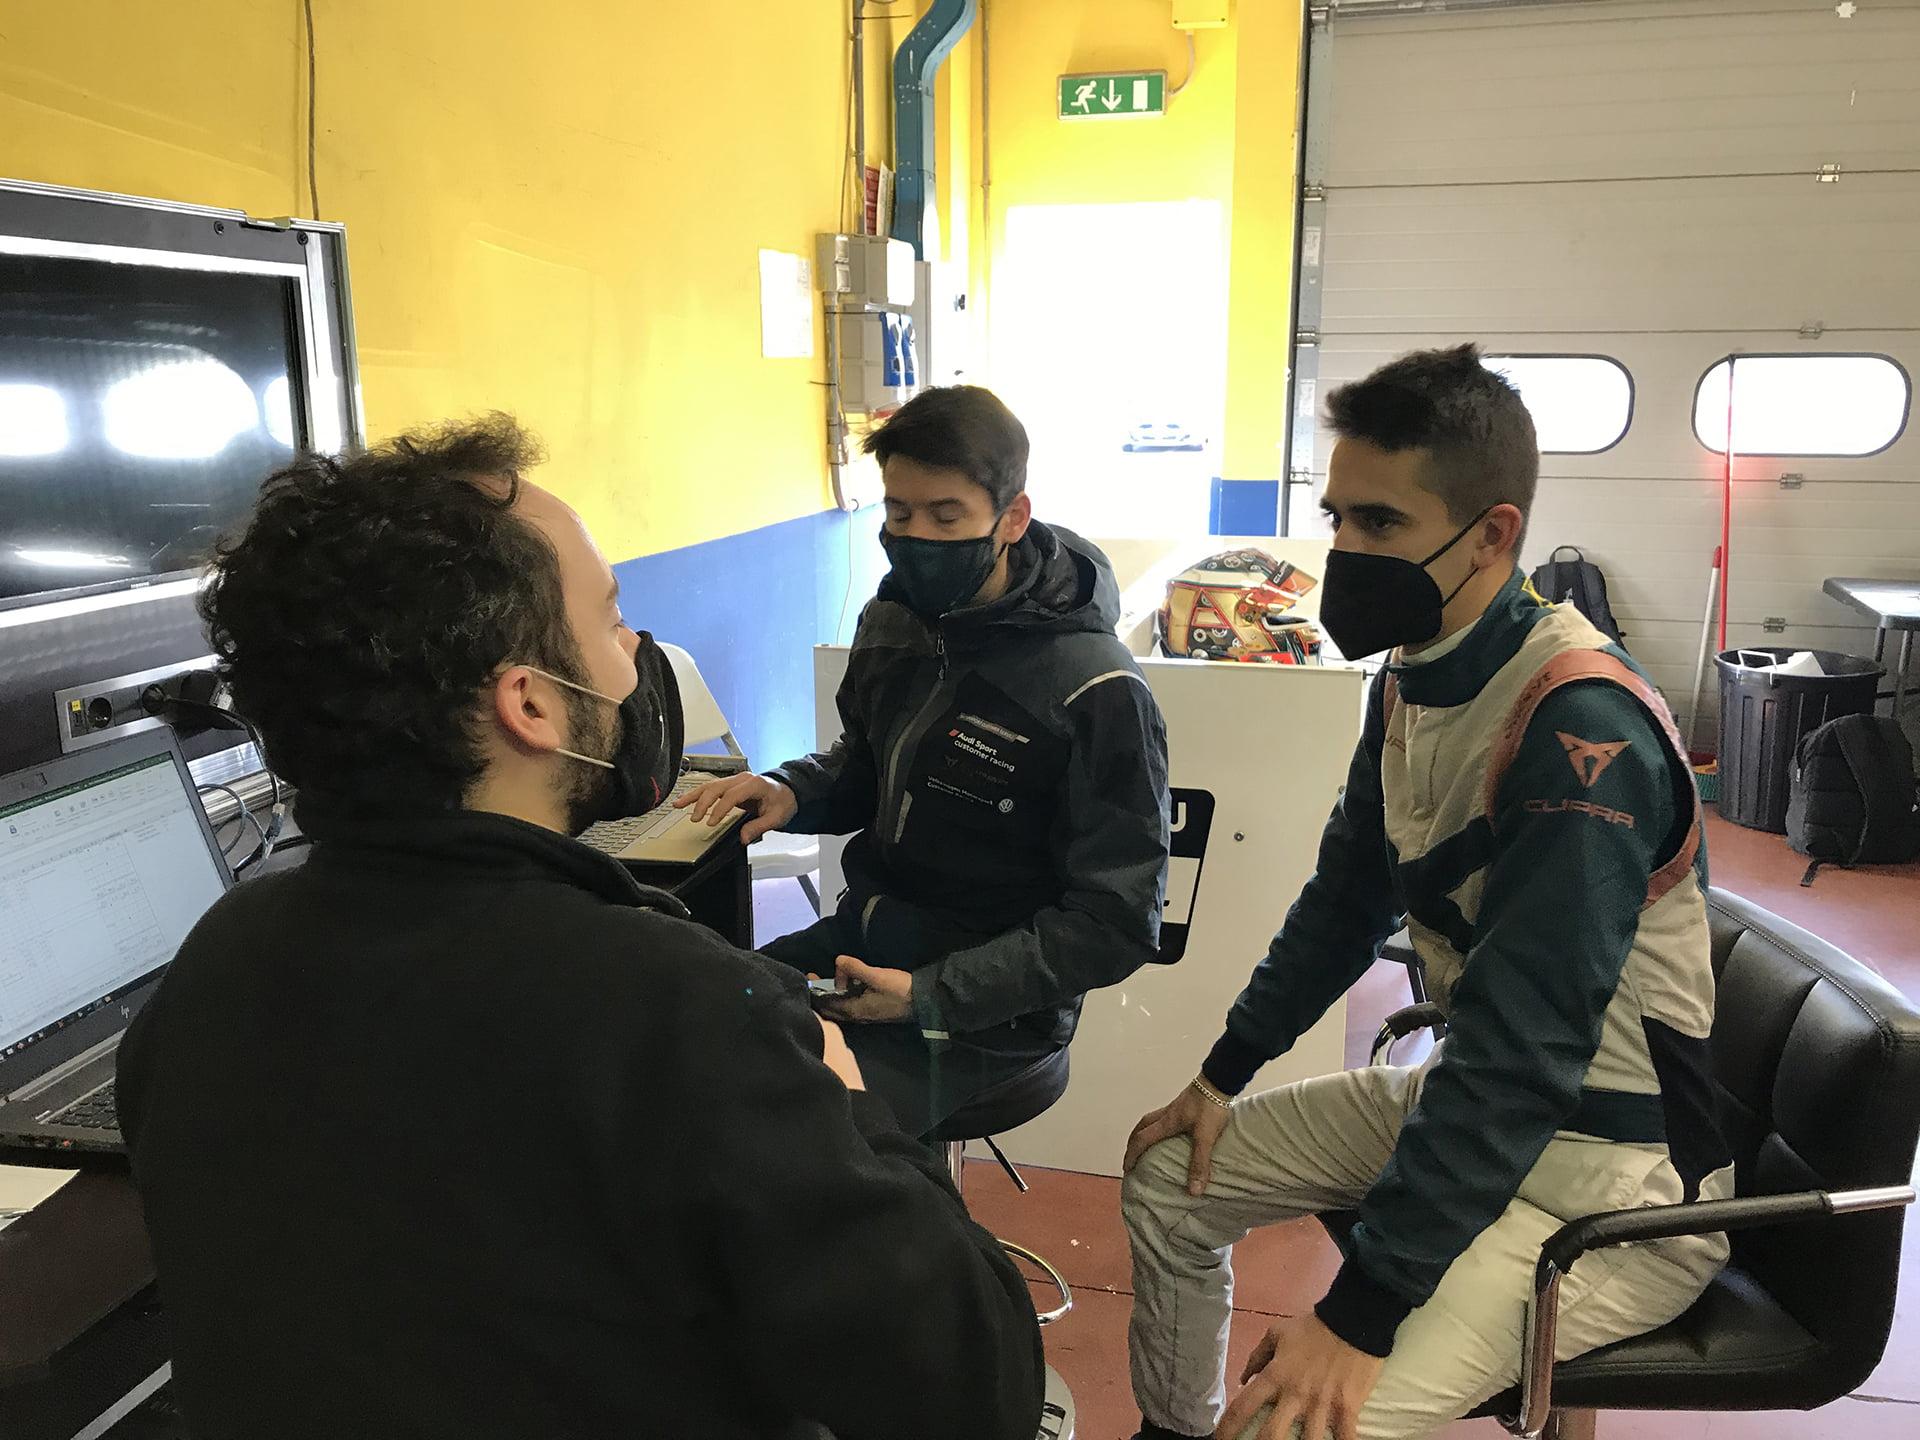 Mikel Azcona debutó con el Cupra e-Racer